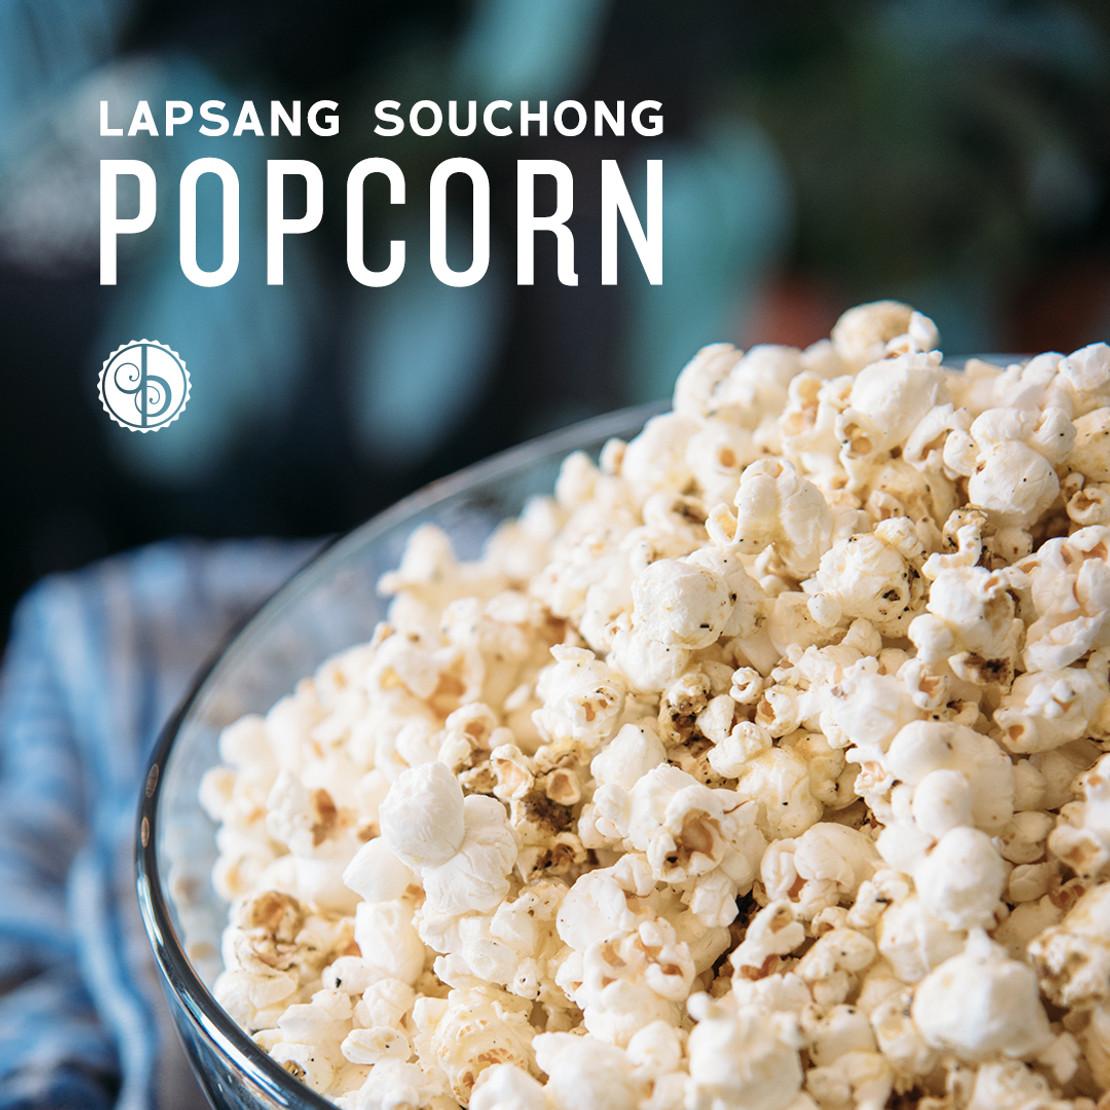 Lapsang Souchong Popcorn